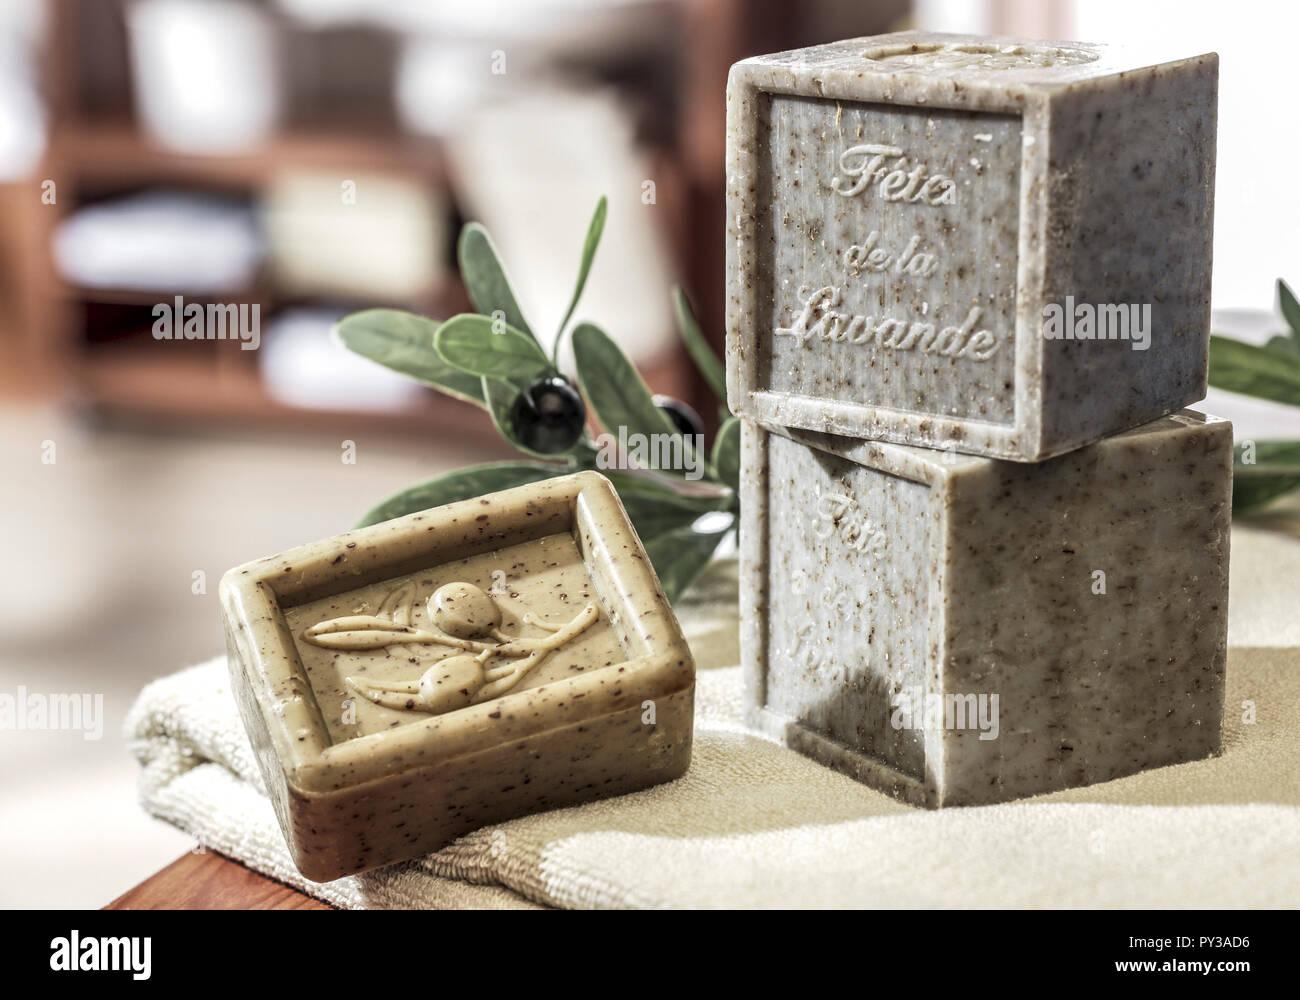 Seifenstuecke Mit Olivenoel Stockfoto